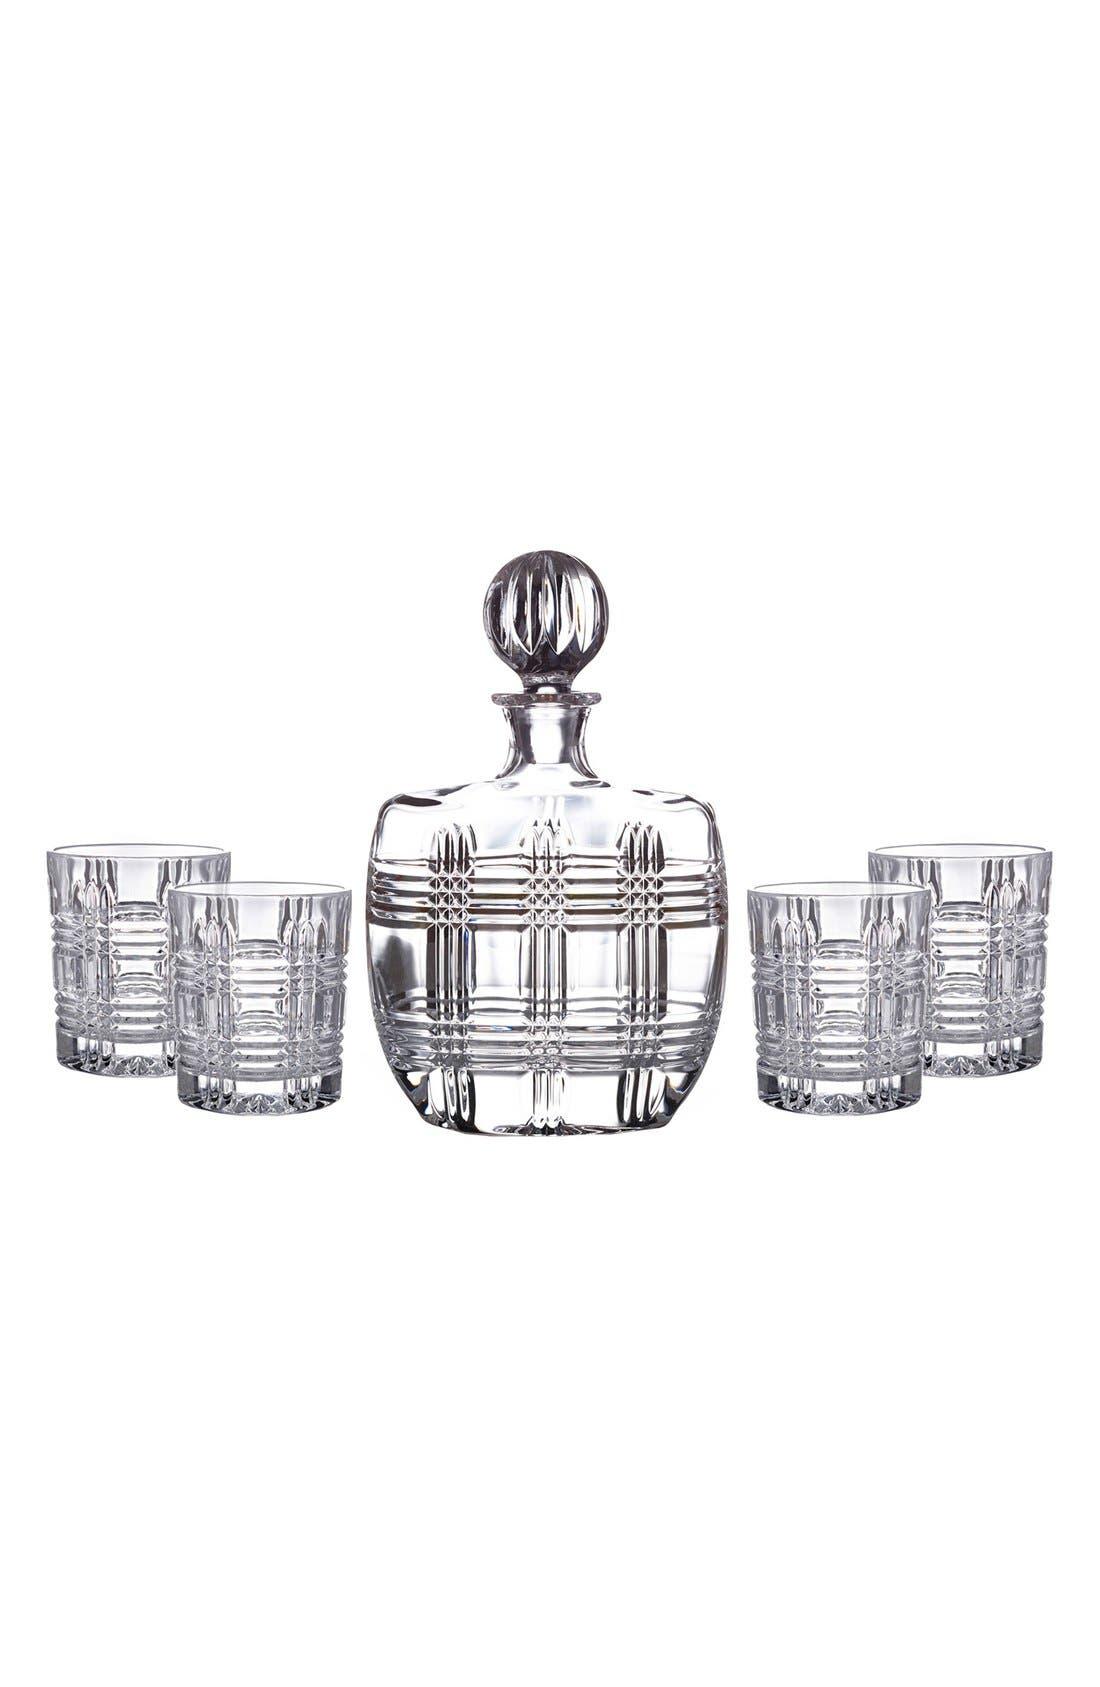 Main Image - American Atelier Bridgeport 5-Piece Decanter & Whiskey Glasses Set